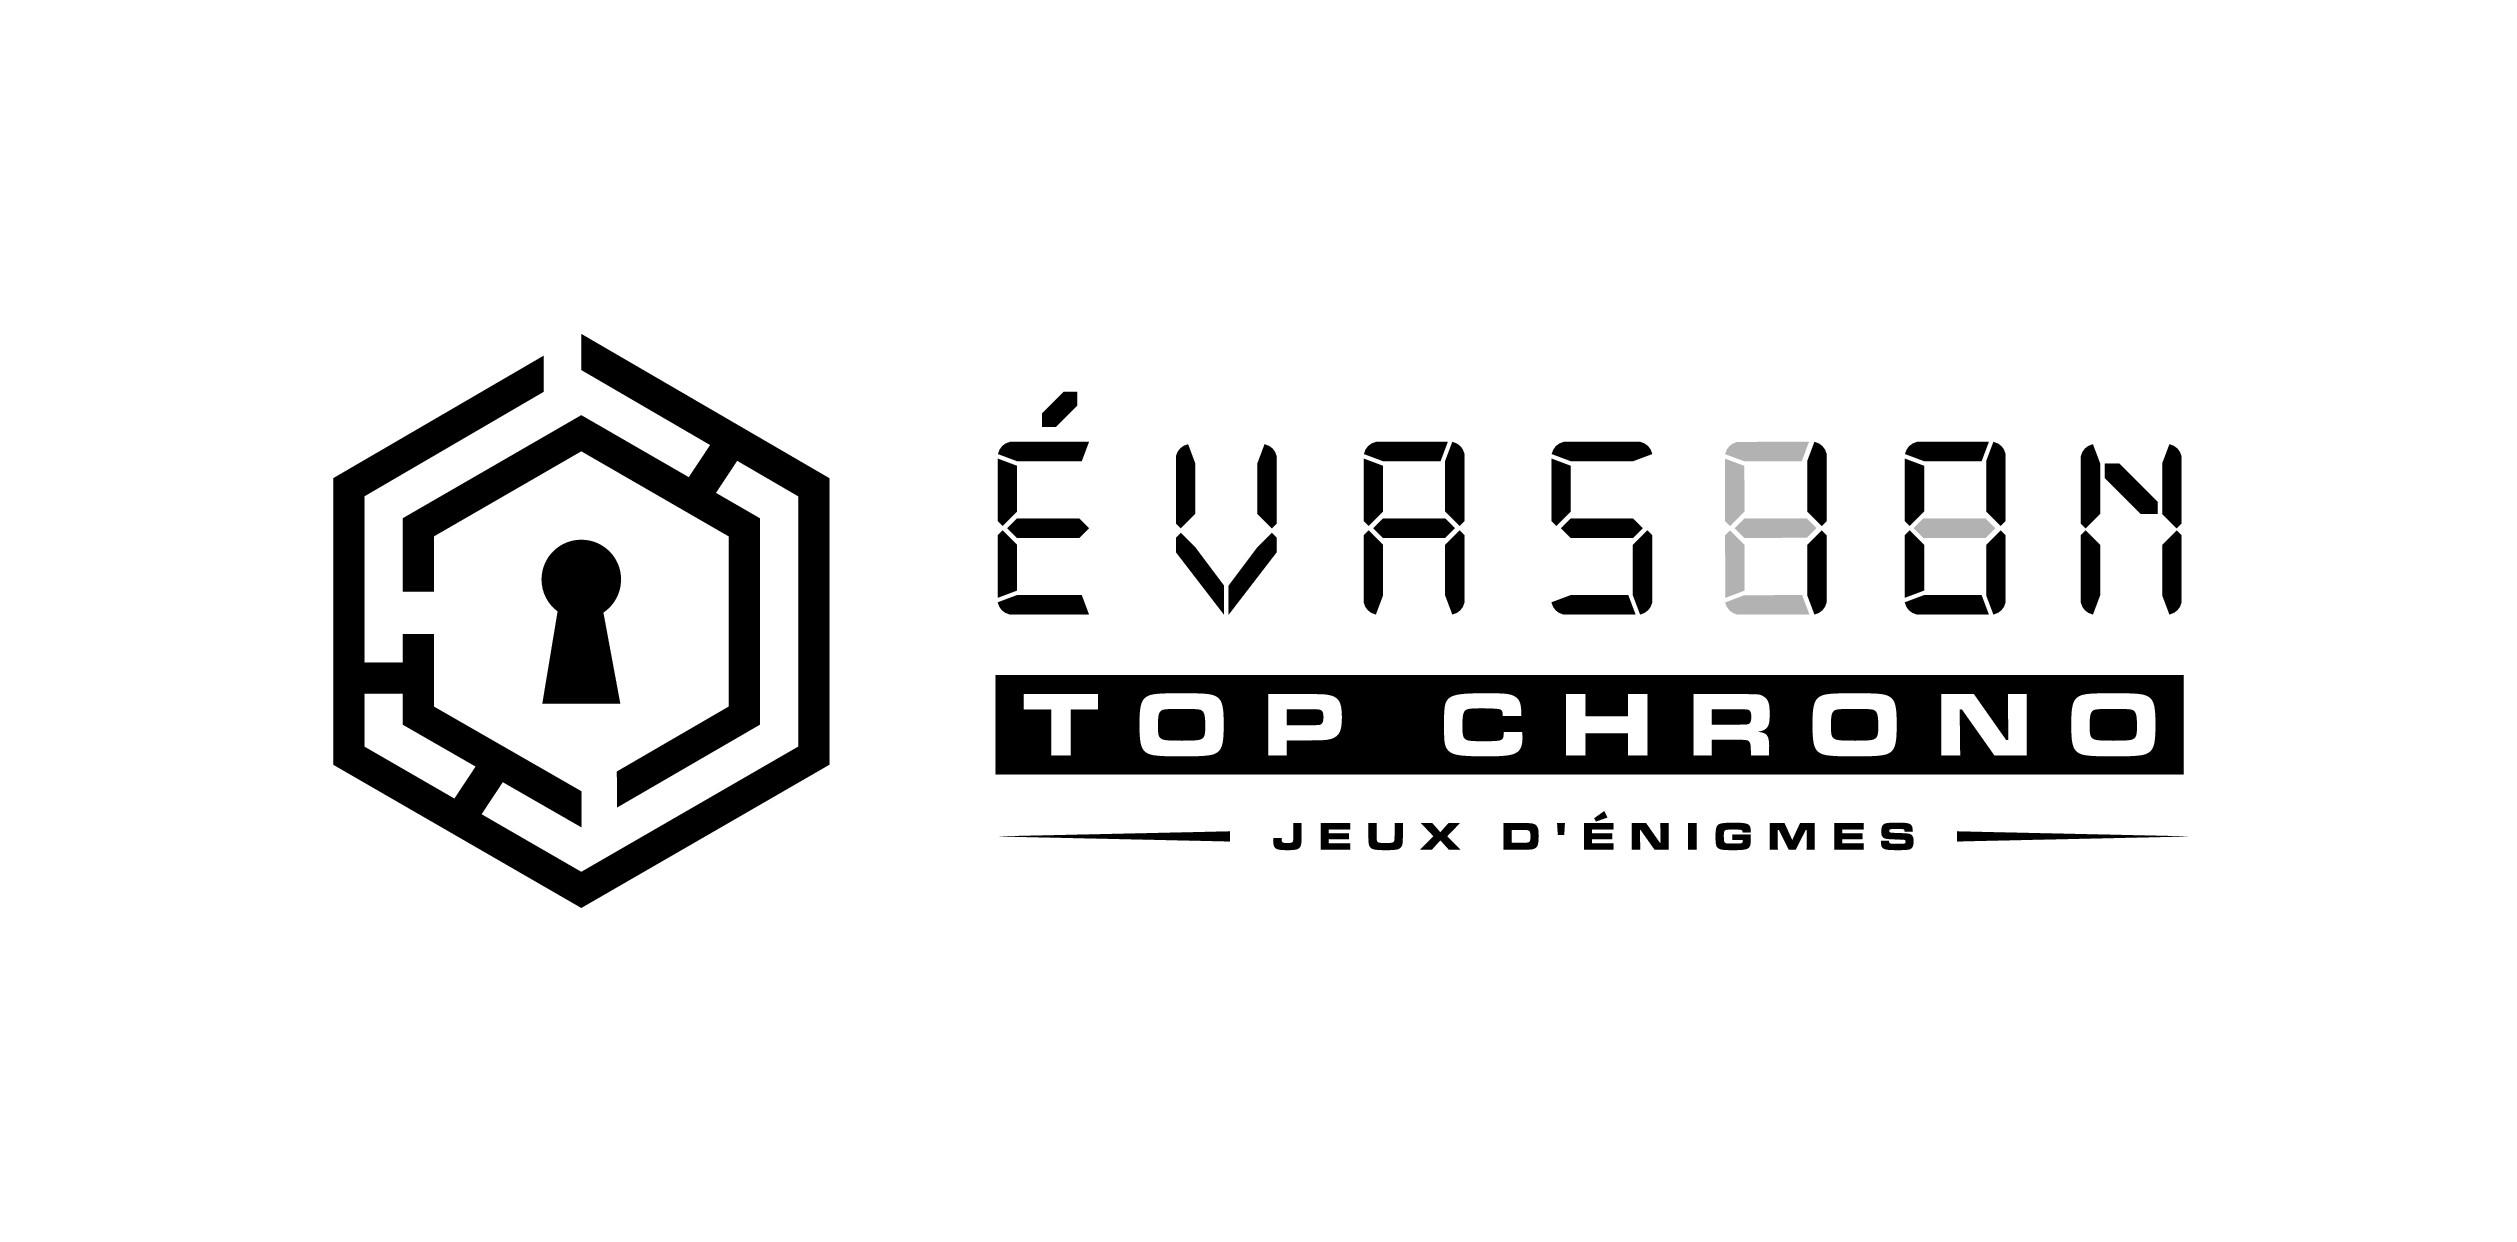 Évasion Top Chrono needs your talent!